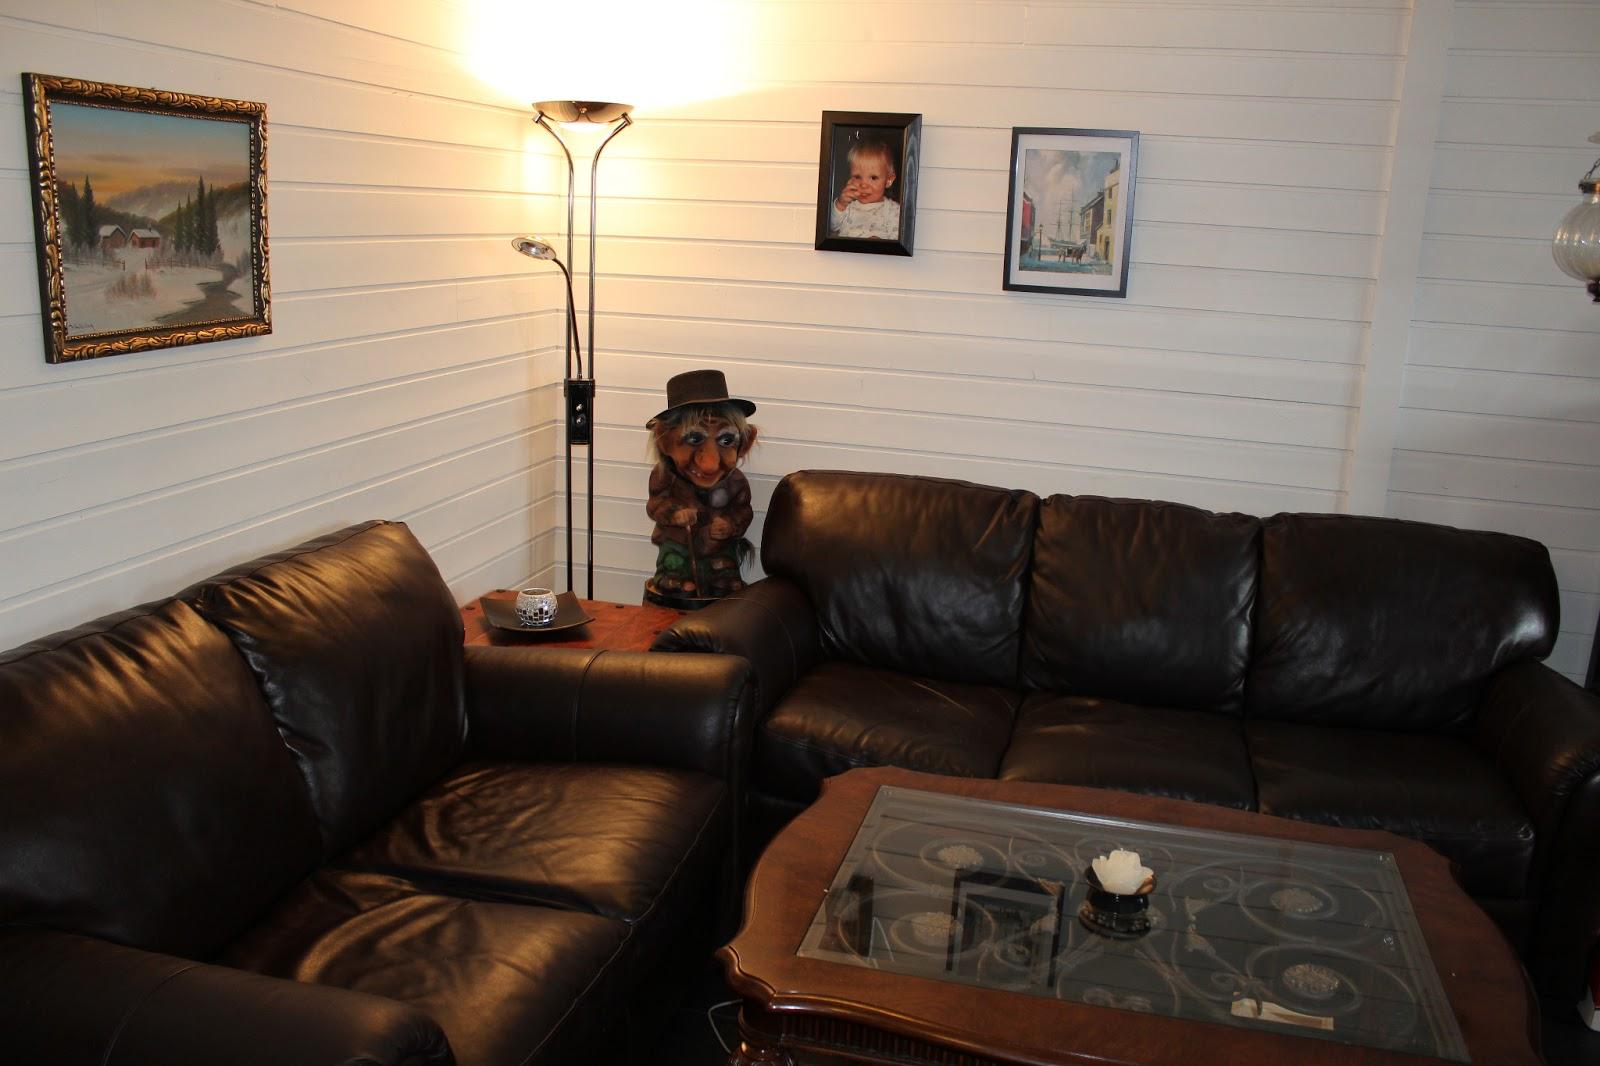 fremtida kommer komplett stue fra brukthandel. Black Bedroom Furniture Sets. Home Design Ideas